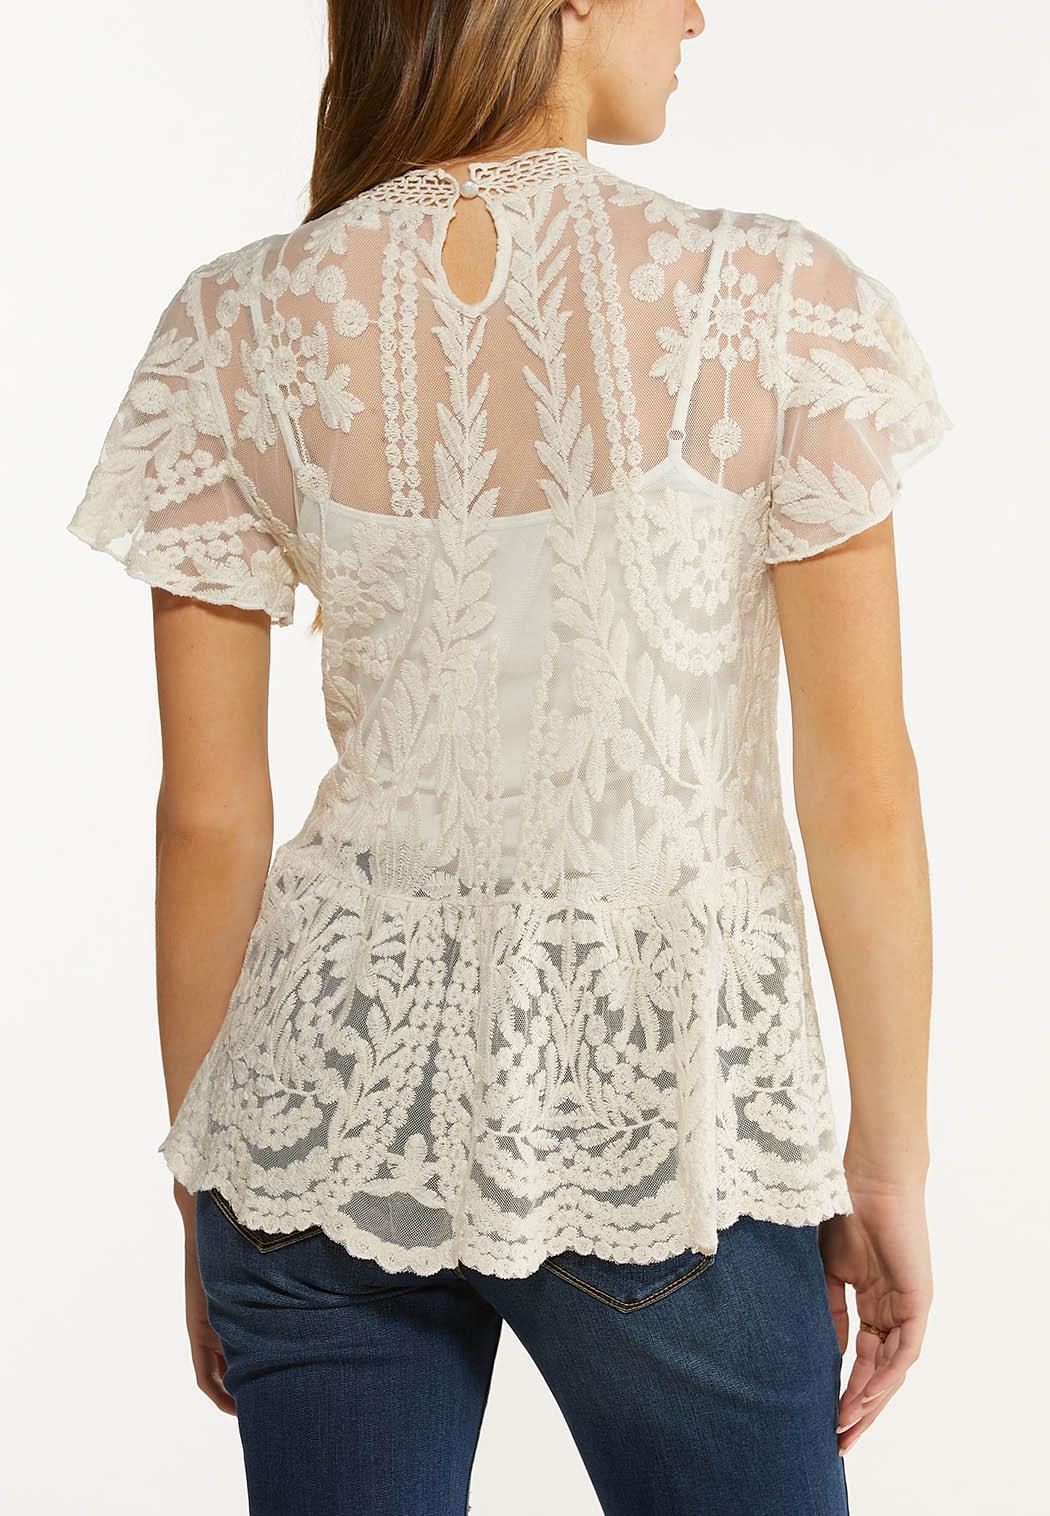 Mesh Embroidered Peplum Top (Item #44546689)